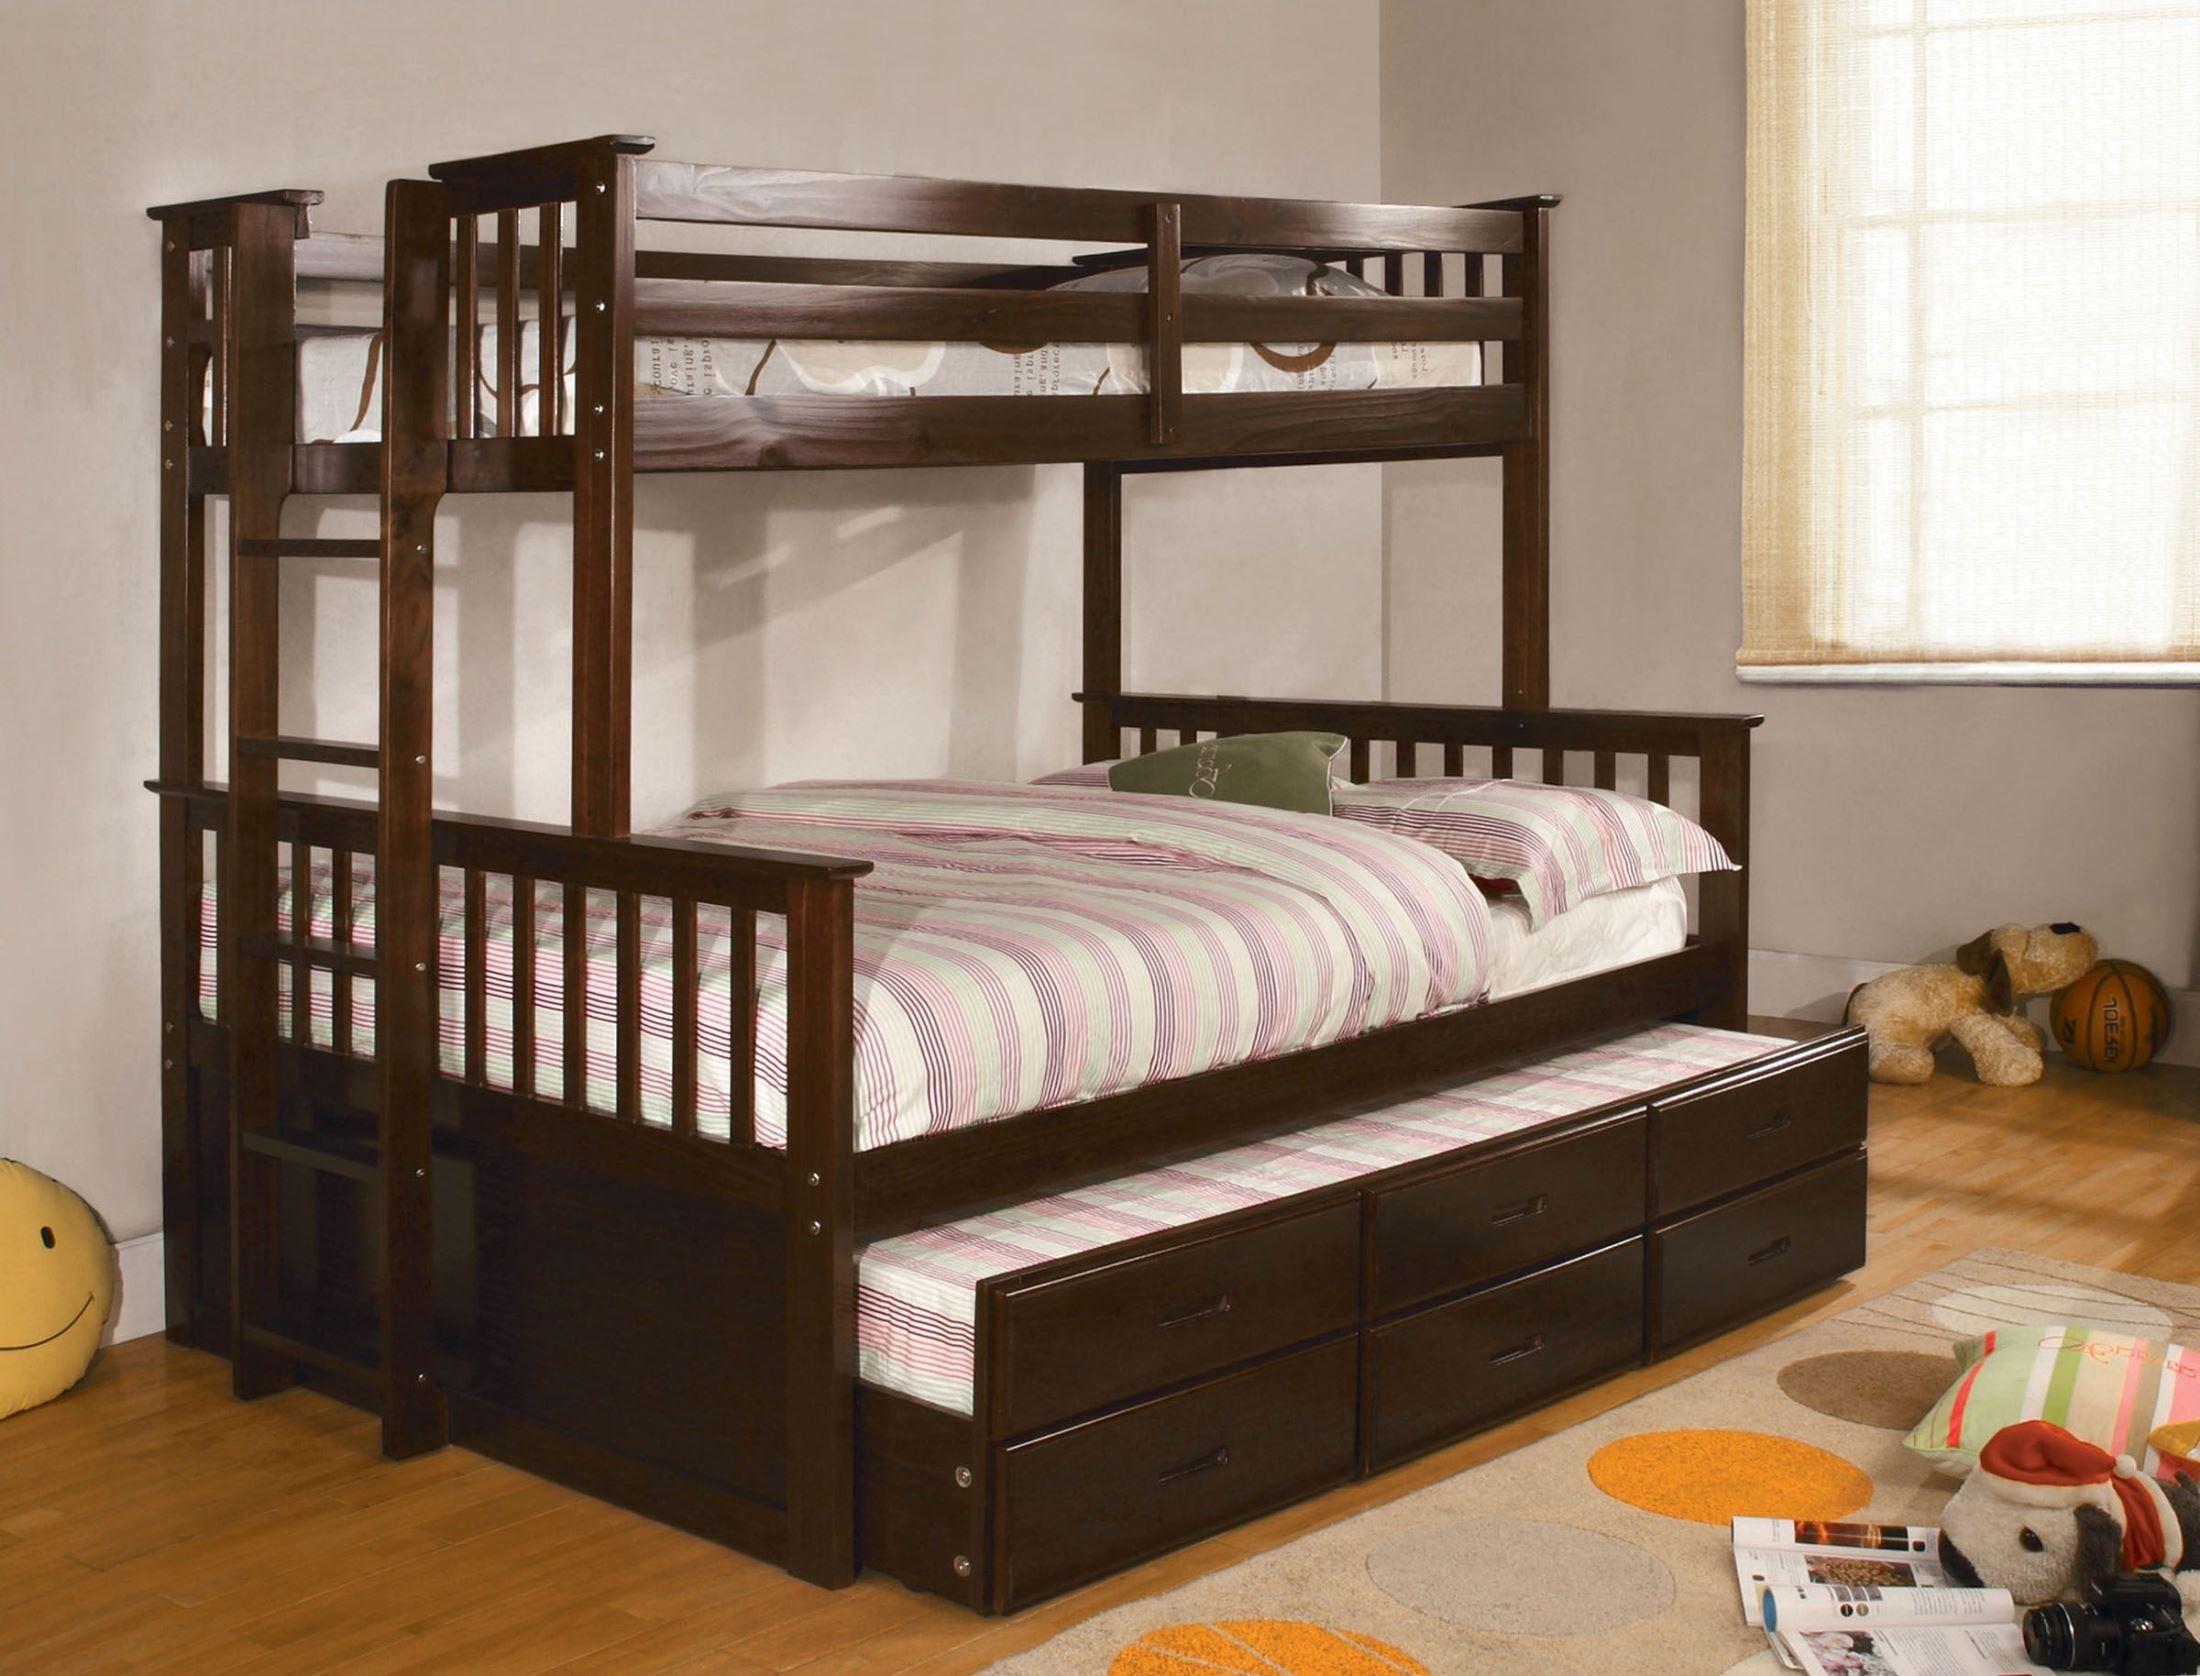 university i espresso twin over full bunk bed from furniture of america cm bk458f exp bed. Black Bedroom Furniture Sets. Home Design Ideas